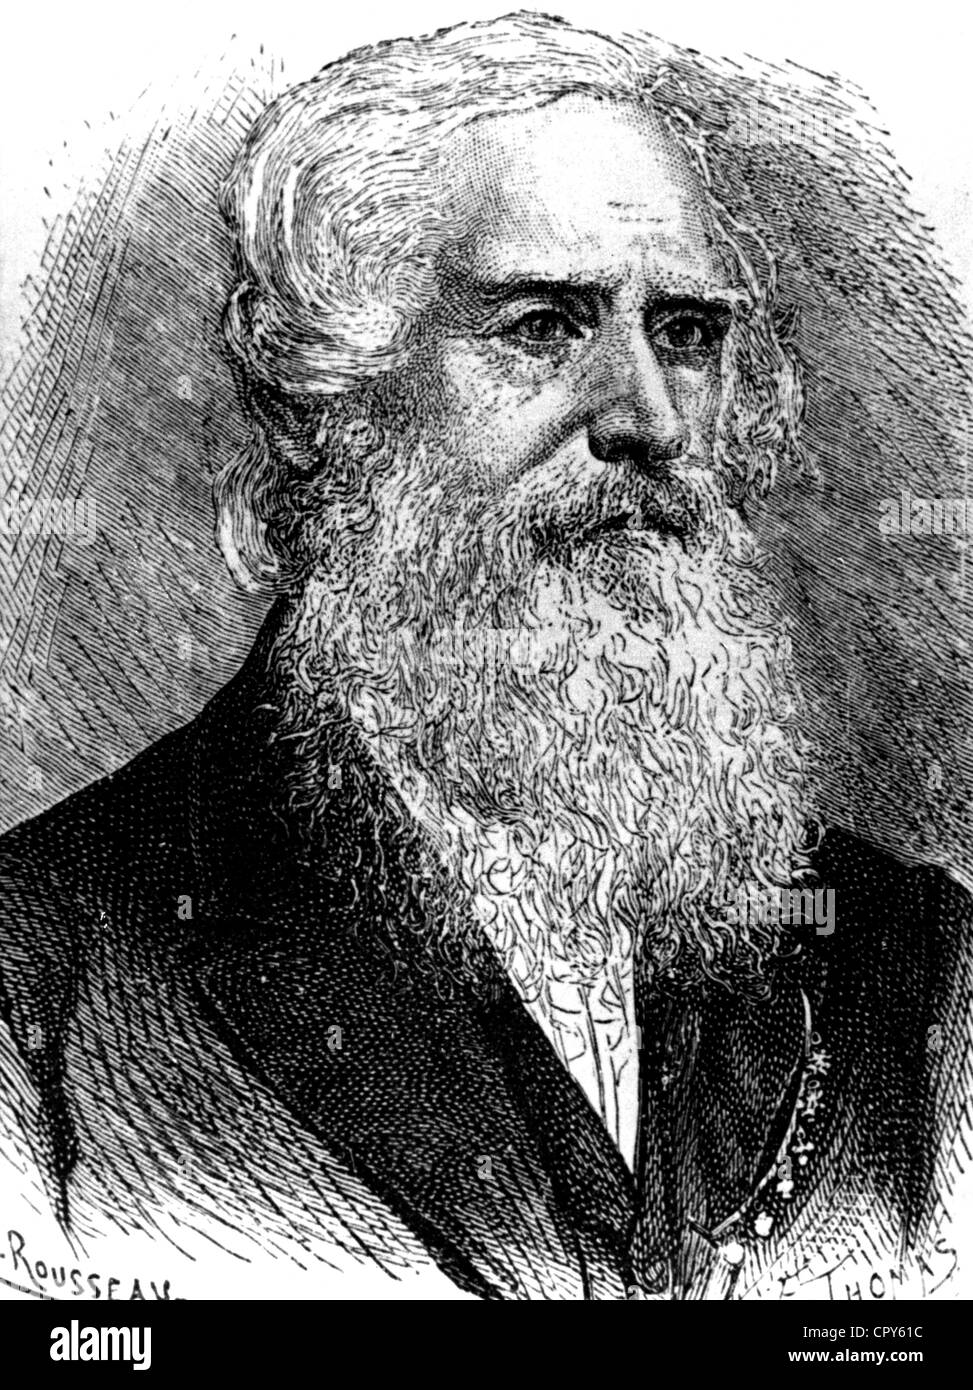 Morse, Samuel, 27.4.1791 - 2.4.1872, American inventor, portrait, wood engraving, 19th century, full beard, inventor, - Stock Image